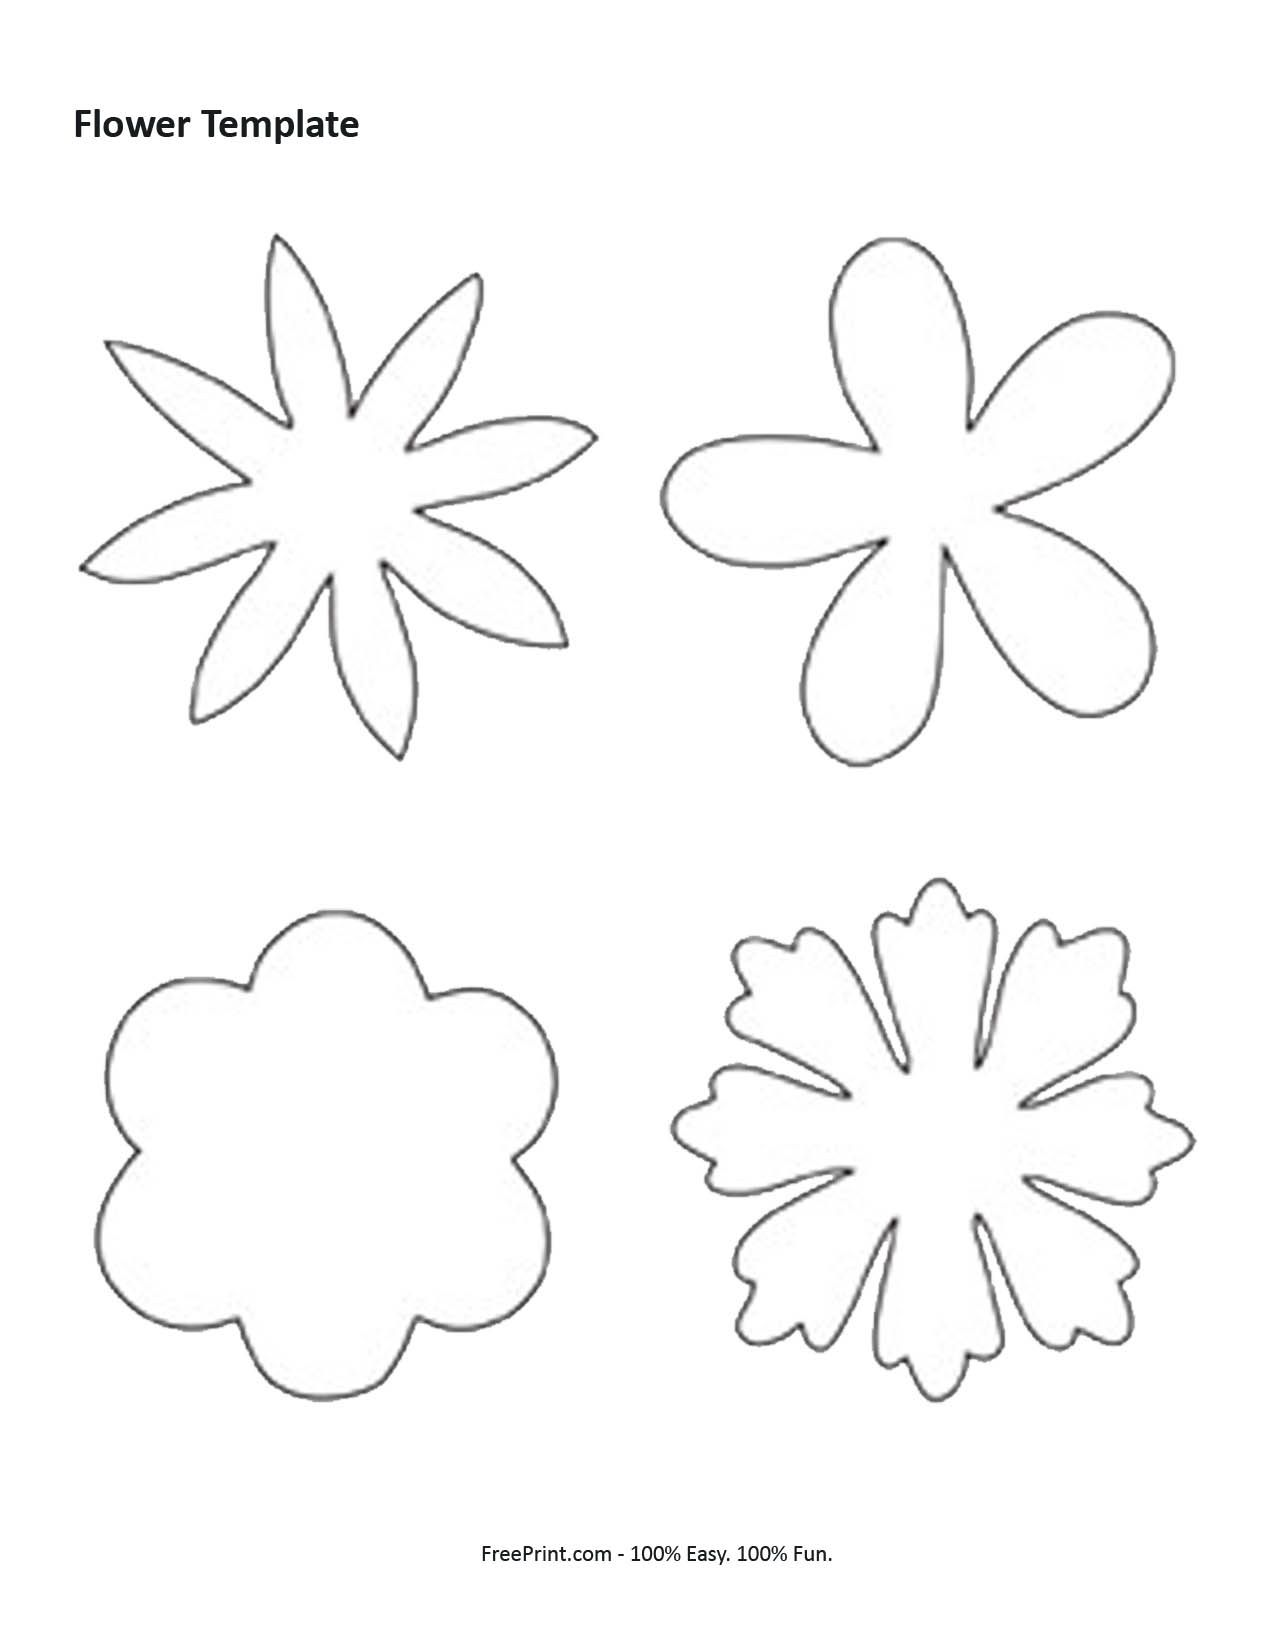 Felt flower template | DIY and Crafts | Pinterest